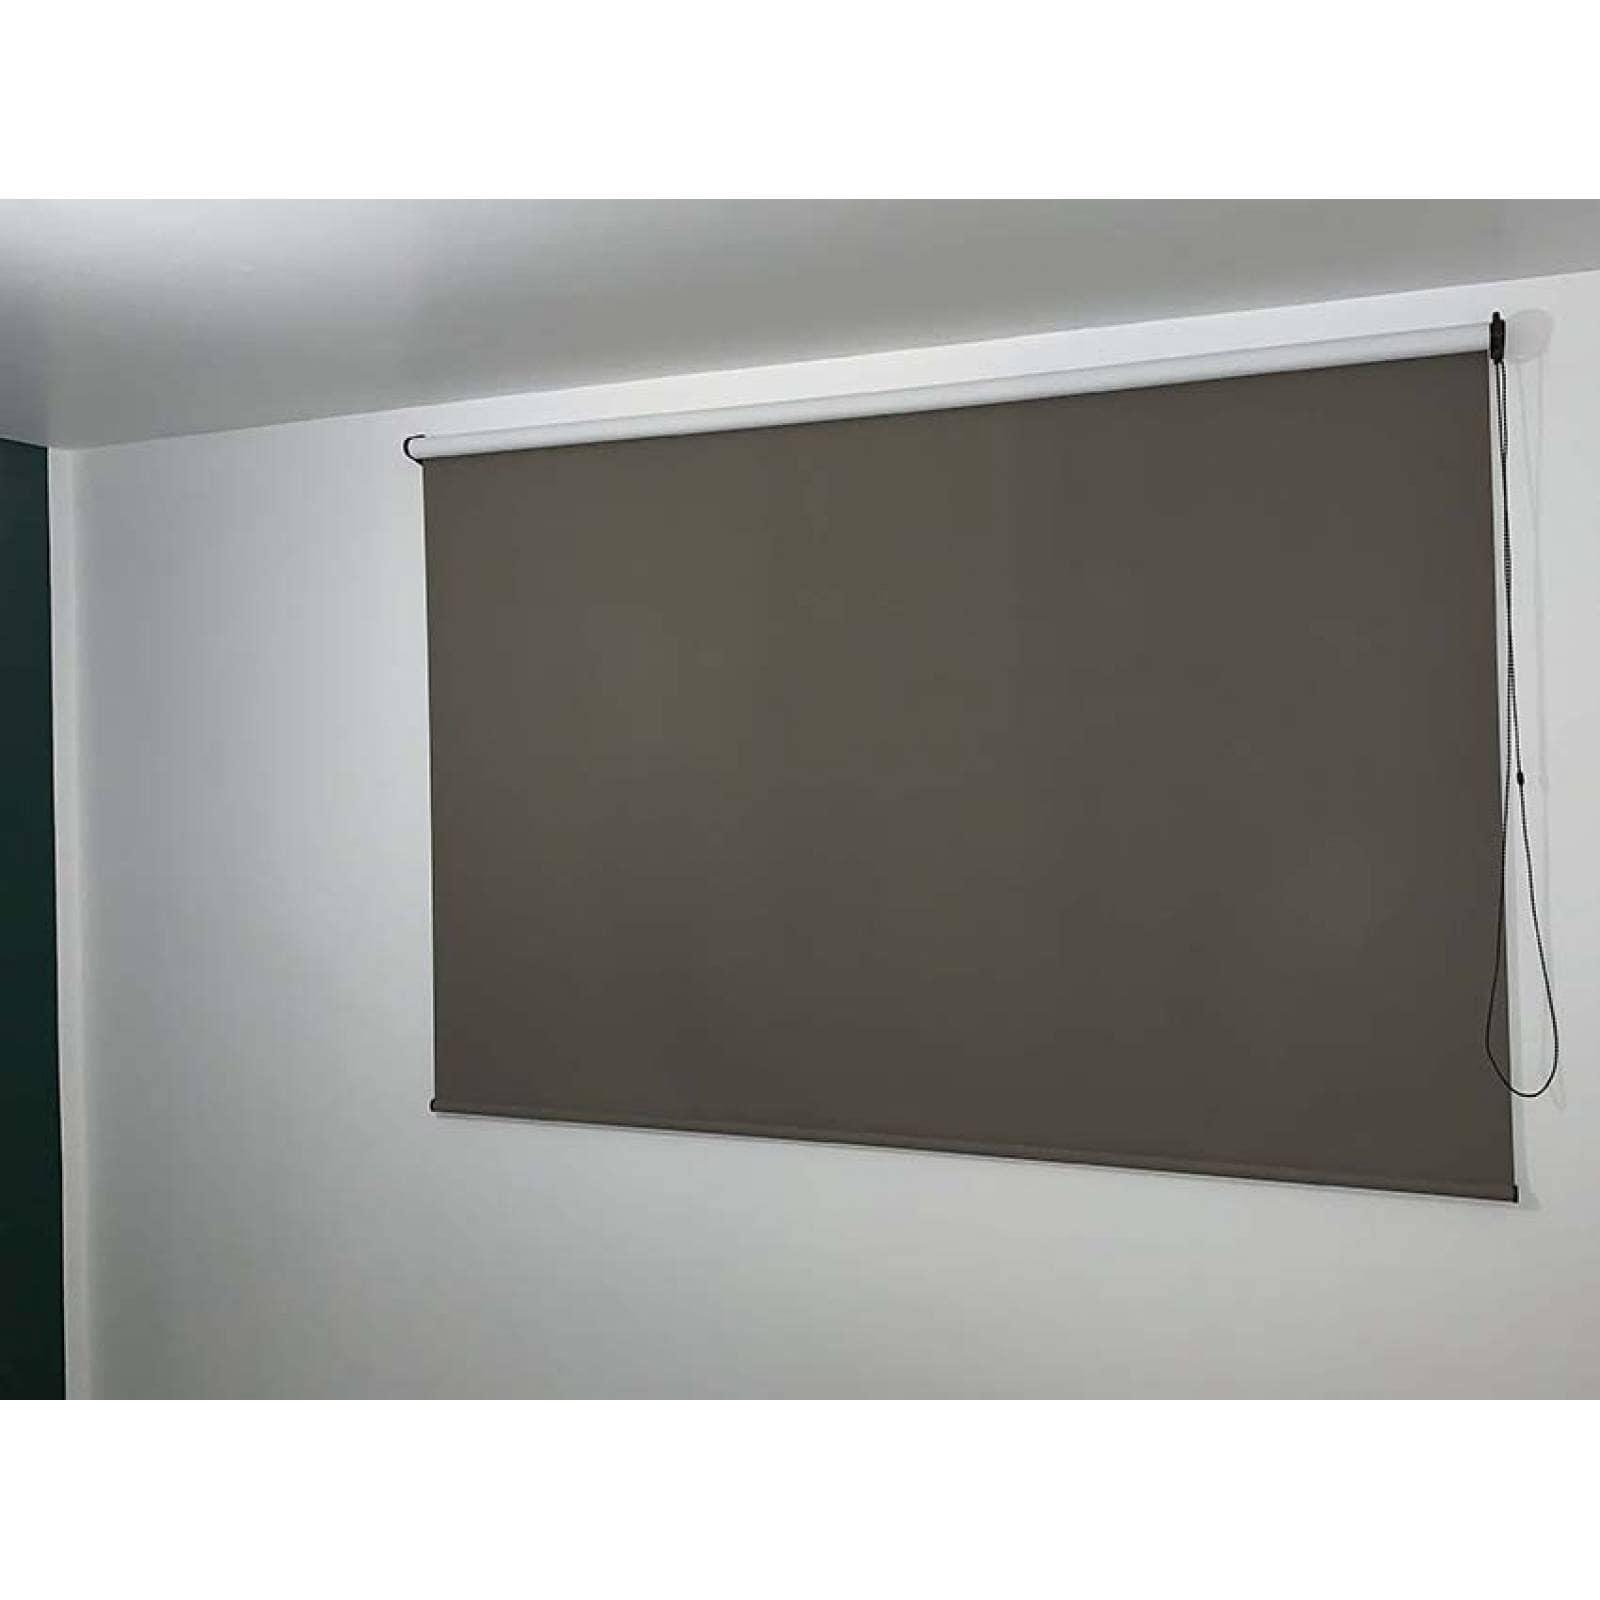 Persianas Blackout modelo 500 100 cm de ancho X hasta 100 cm de largo